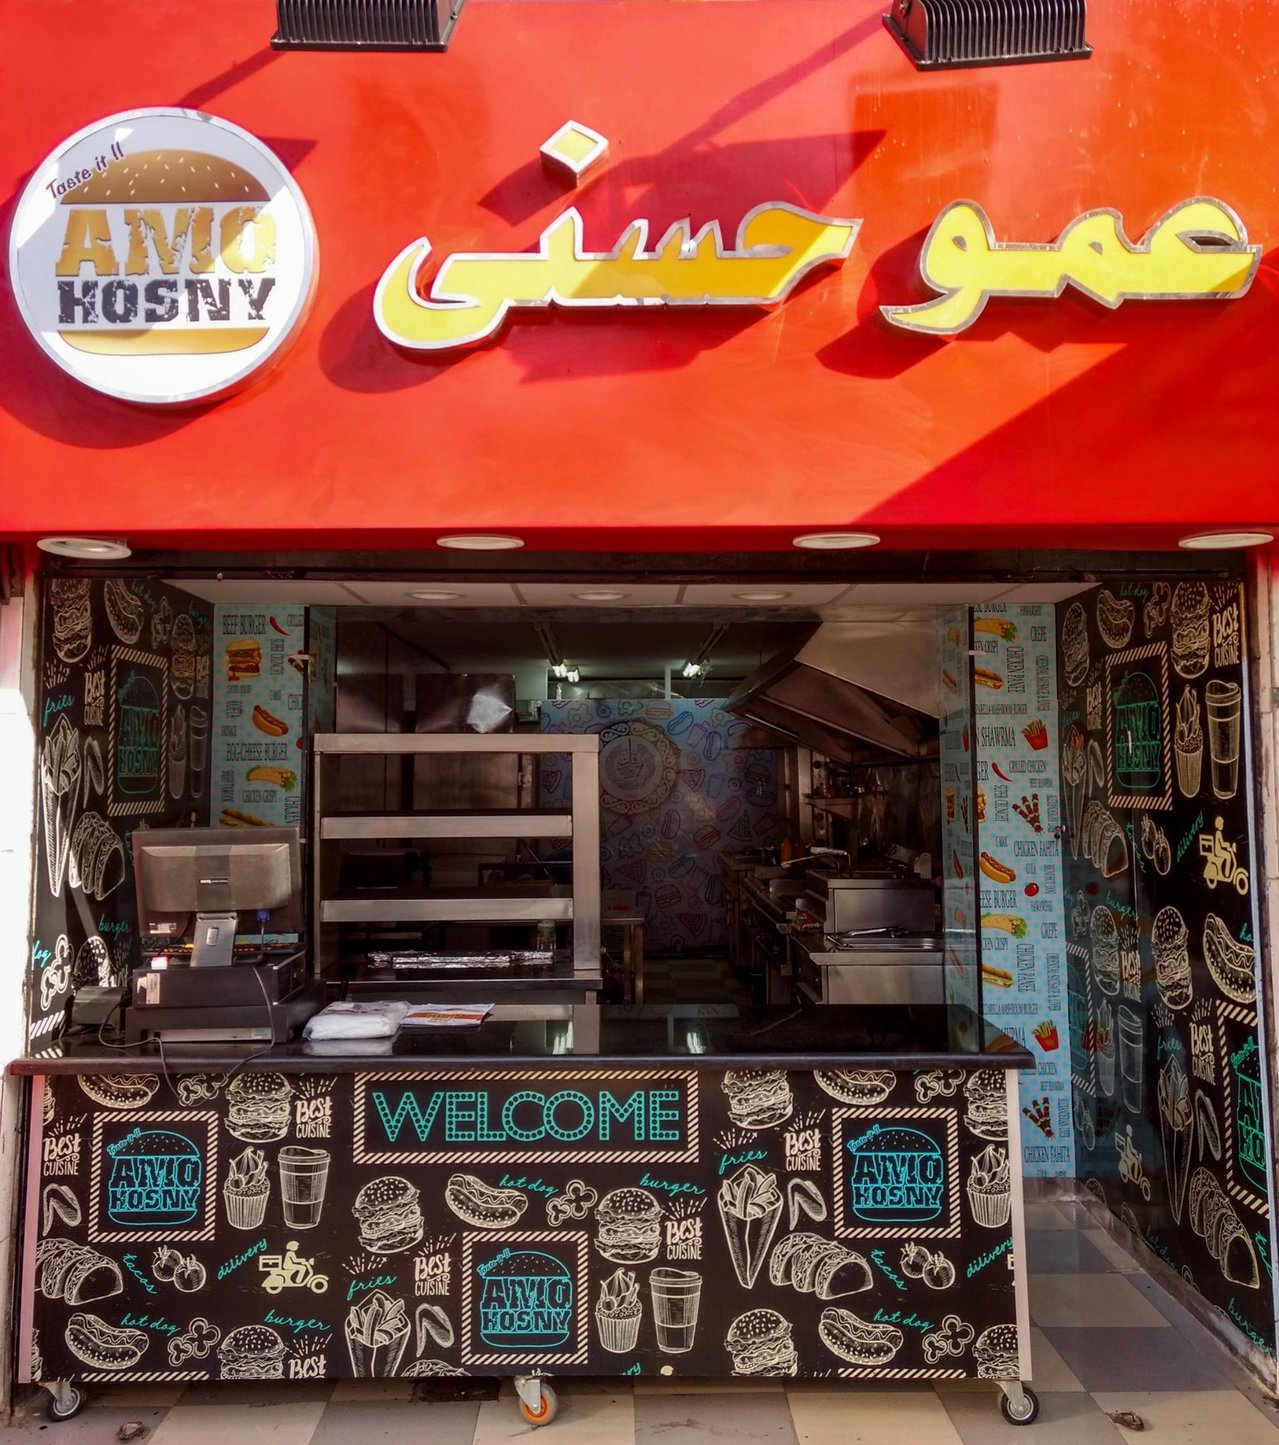 منيو وفروع ورقم مطعم عمو حسني Amo Hosny